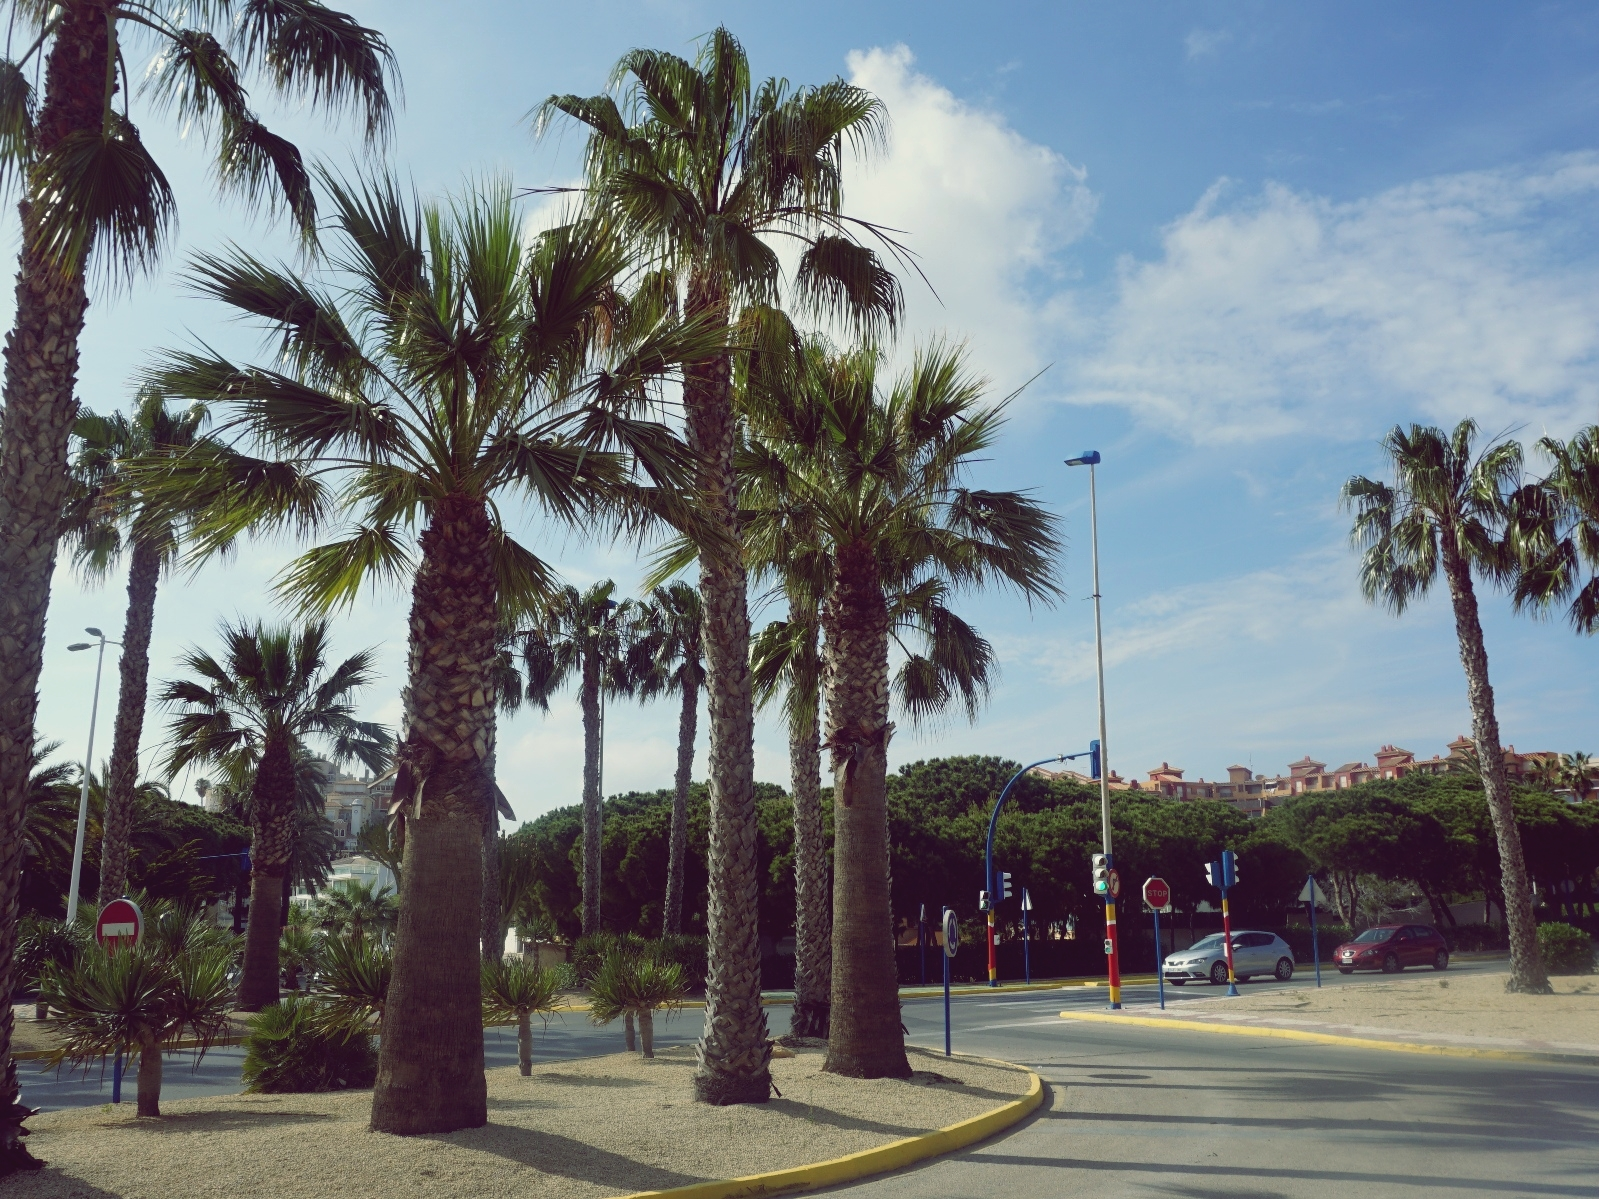 hiszpańskie miasto, La Manga, panidorcia, blog, Hiszpania, podróże, hiszpańskie rondo